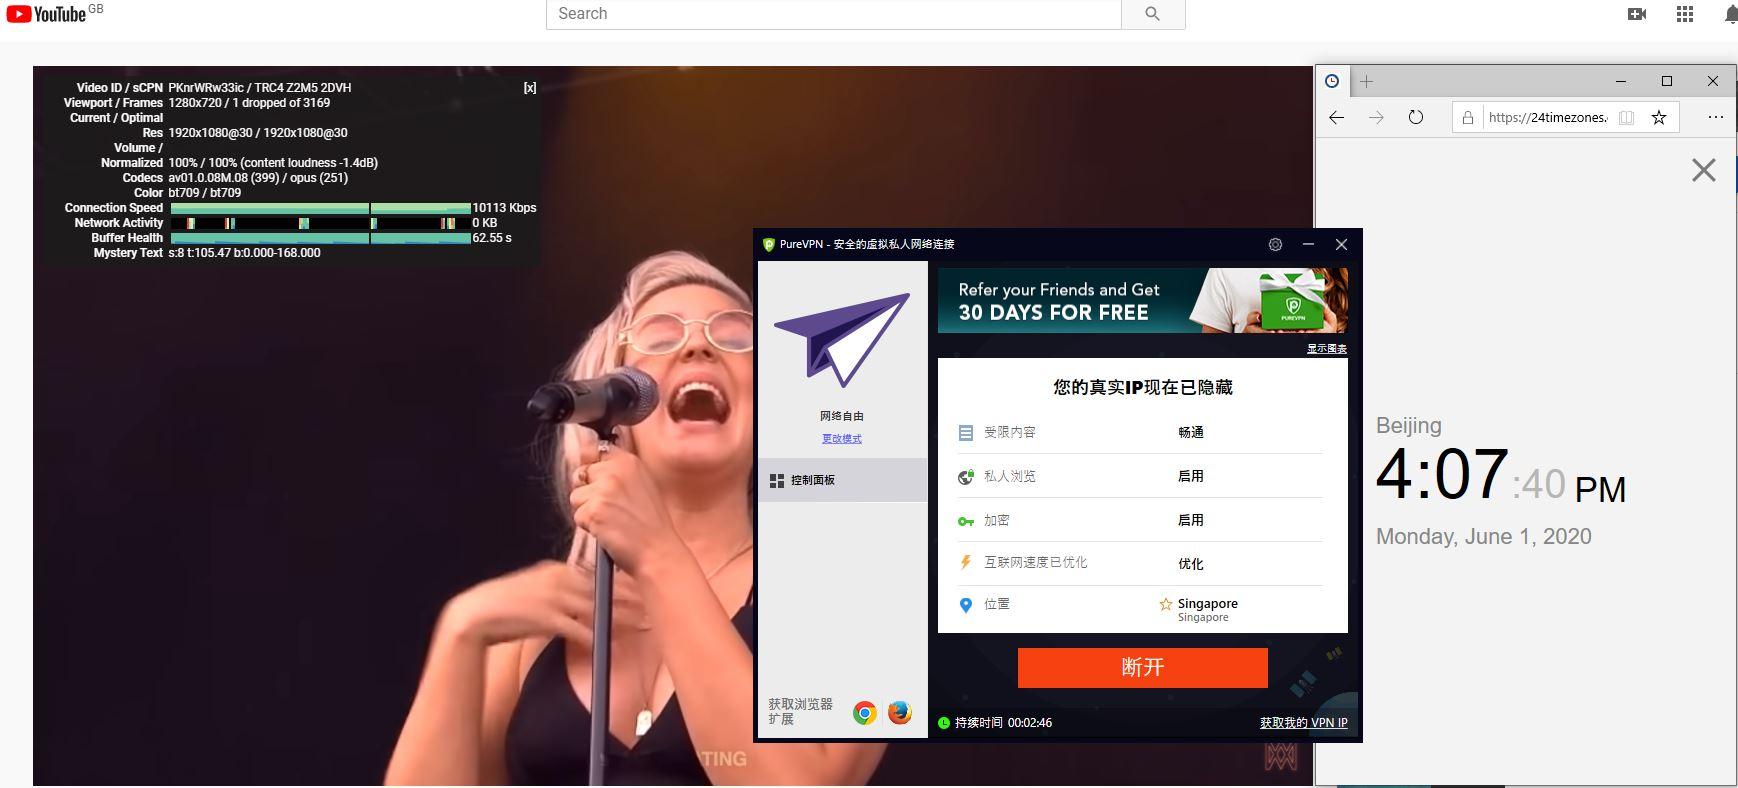 Windows10 PureVPN UK 中国VPN 翻墙 科学上网 测速-20200601